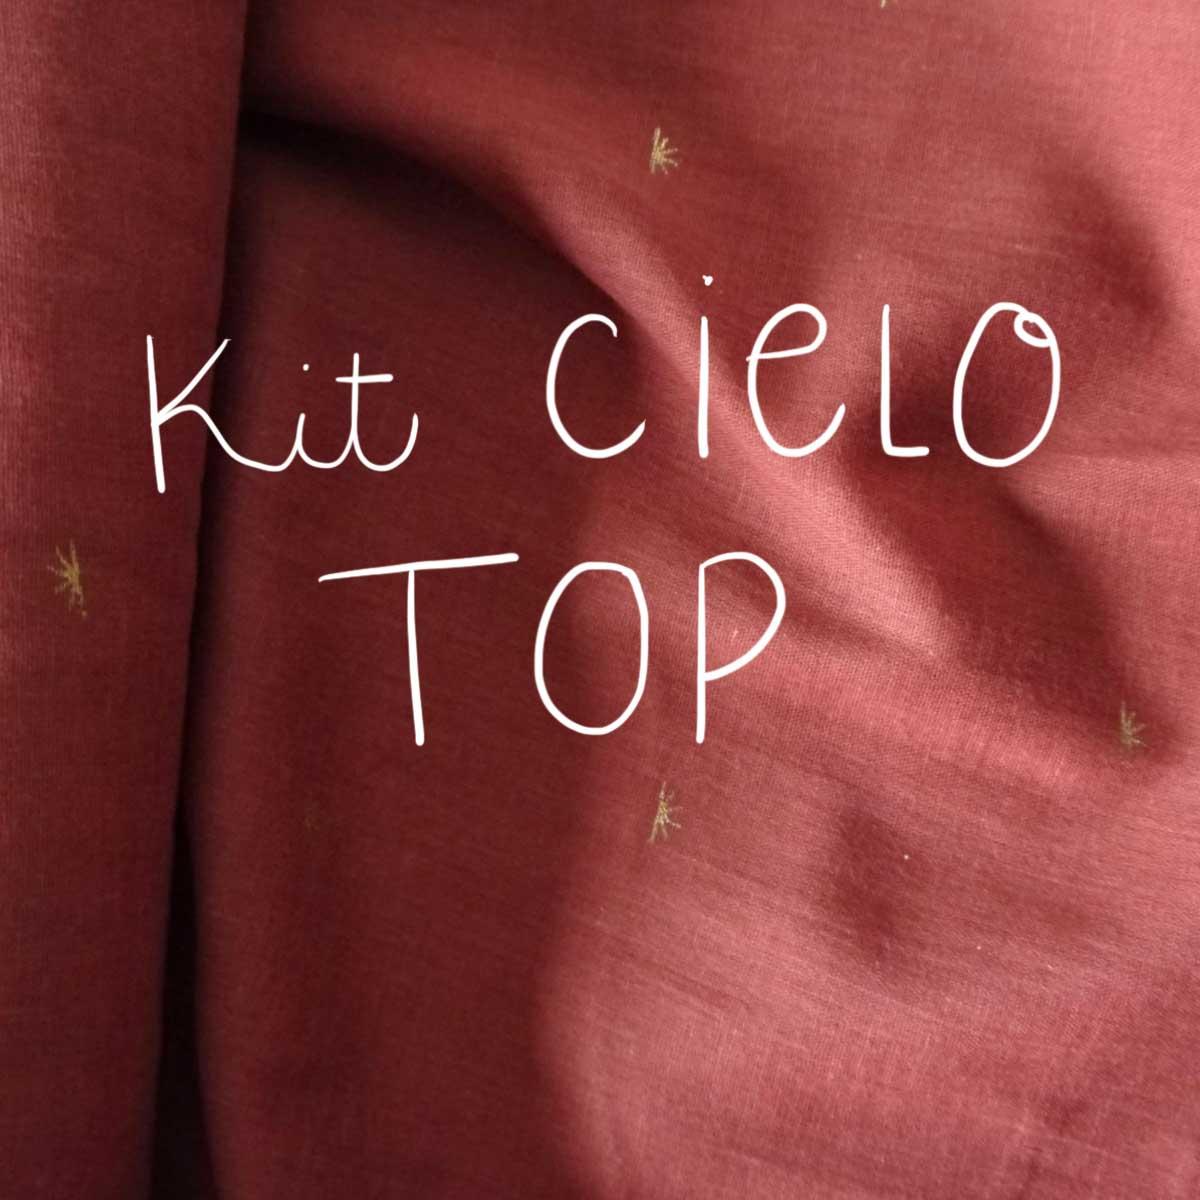 CIELO-SUNSET-CHESTNUT-TOP